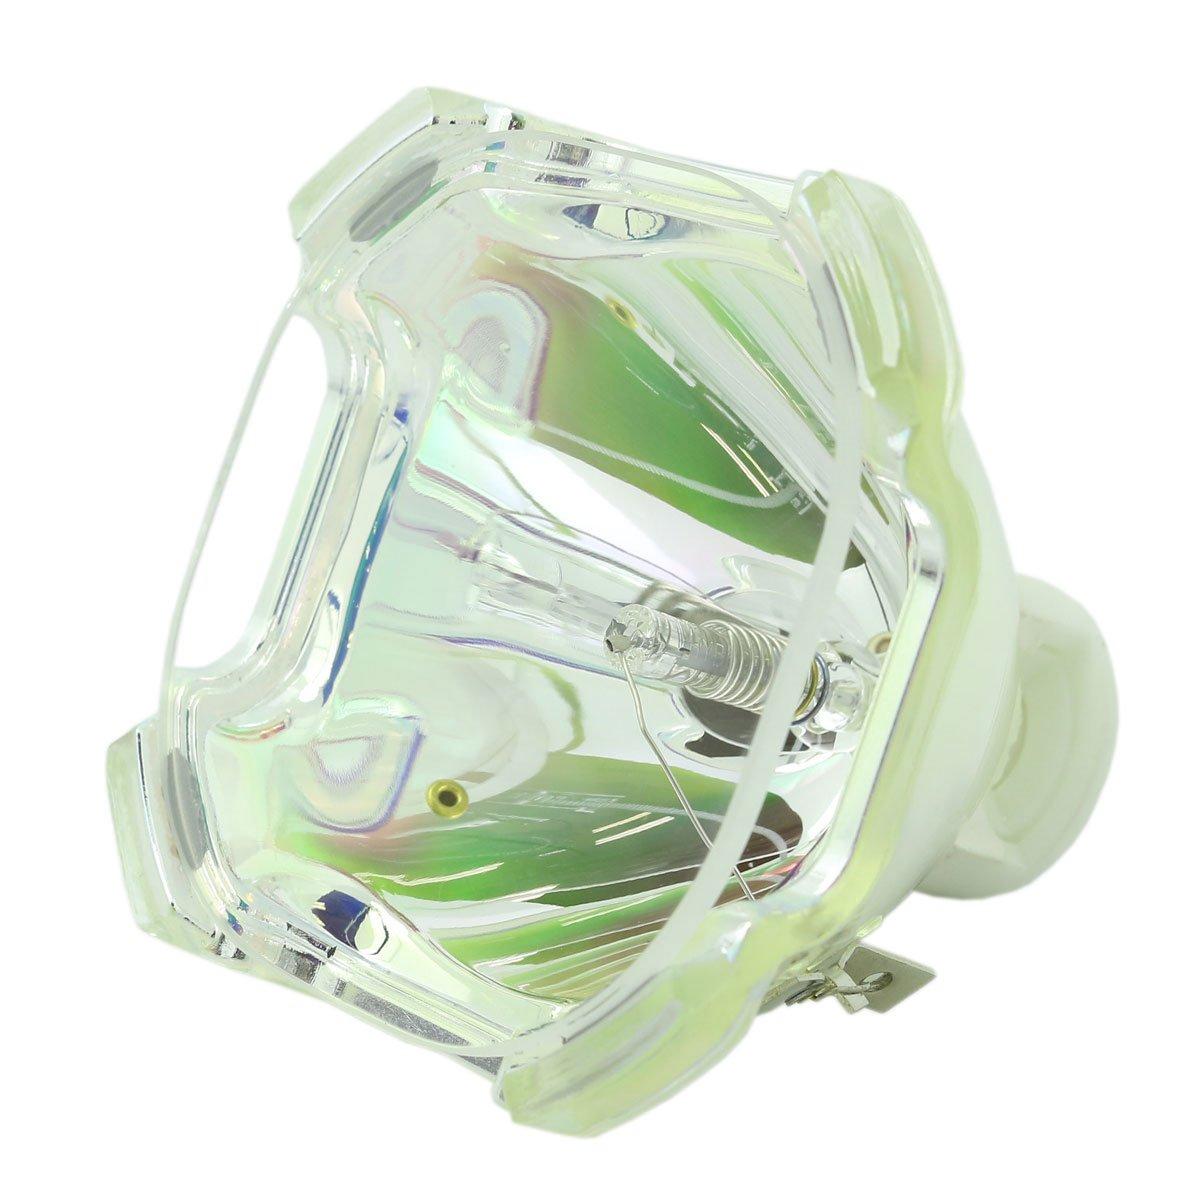 Lutema プロジェクター交換用ランプ ハウジング/電球付き Sanyo PLV-WF10-R用 Economy Economy Lamp Only B07NC5P6J7